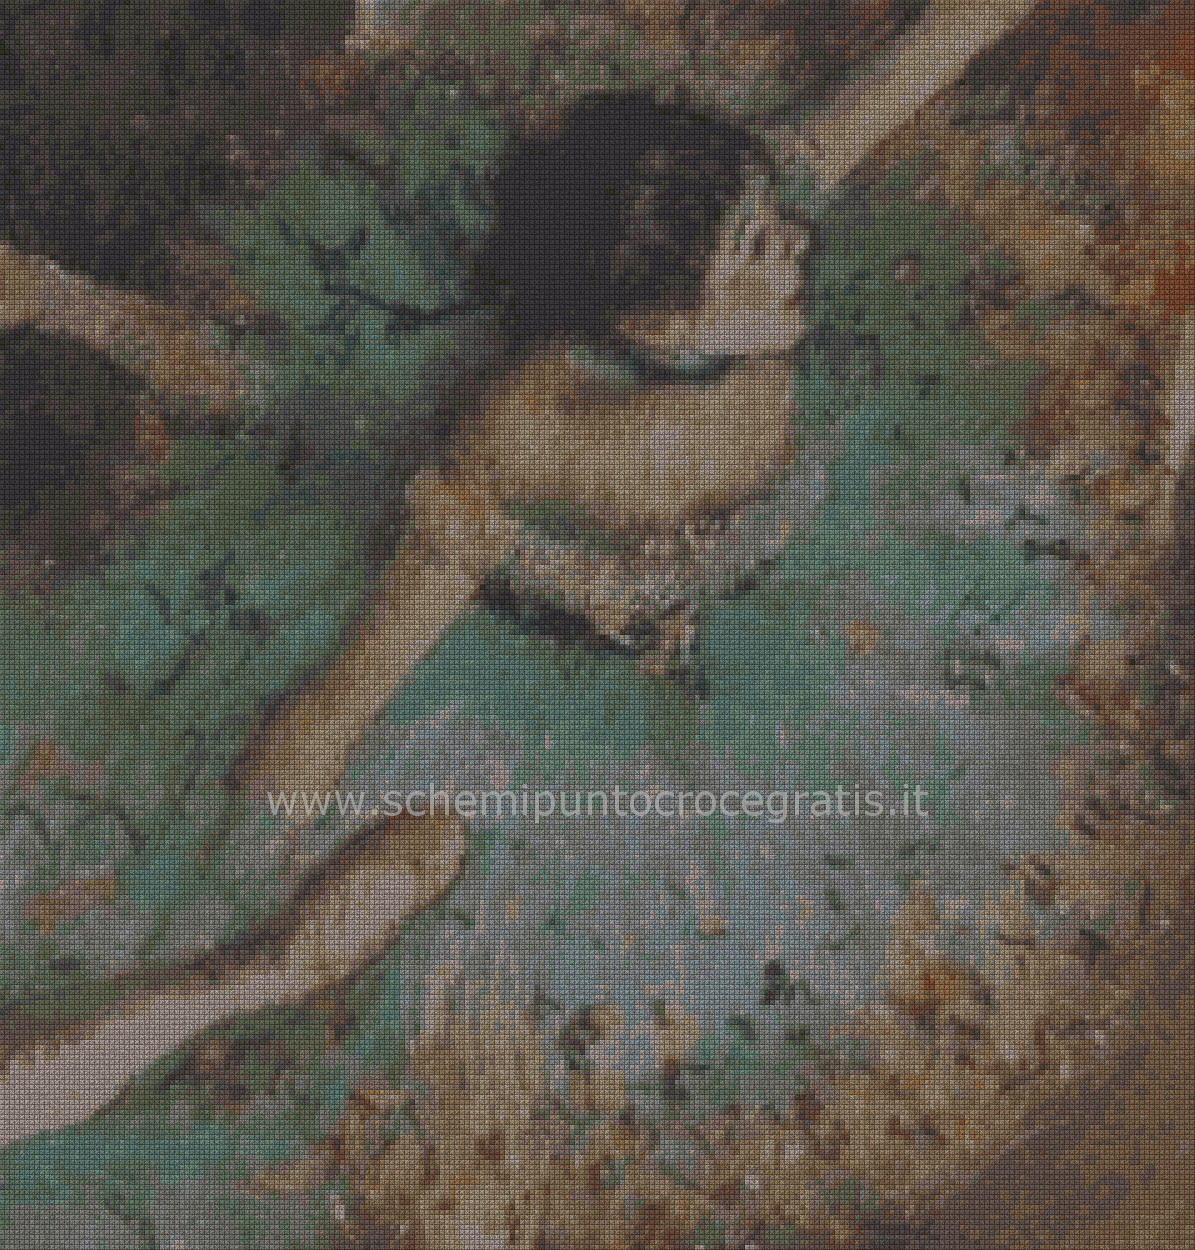 pittori_moderni/degas/degas11.jpg